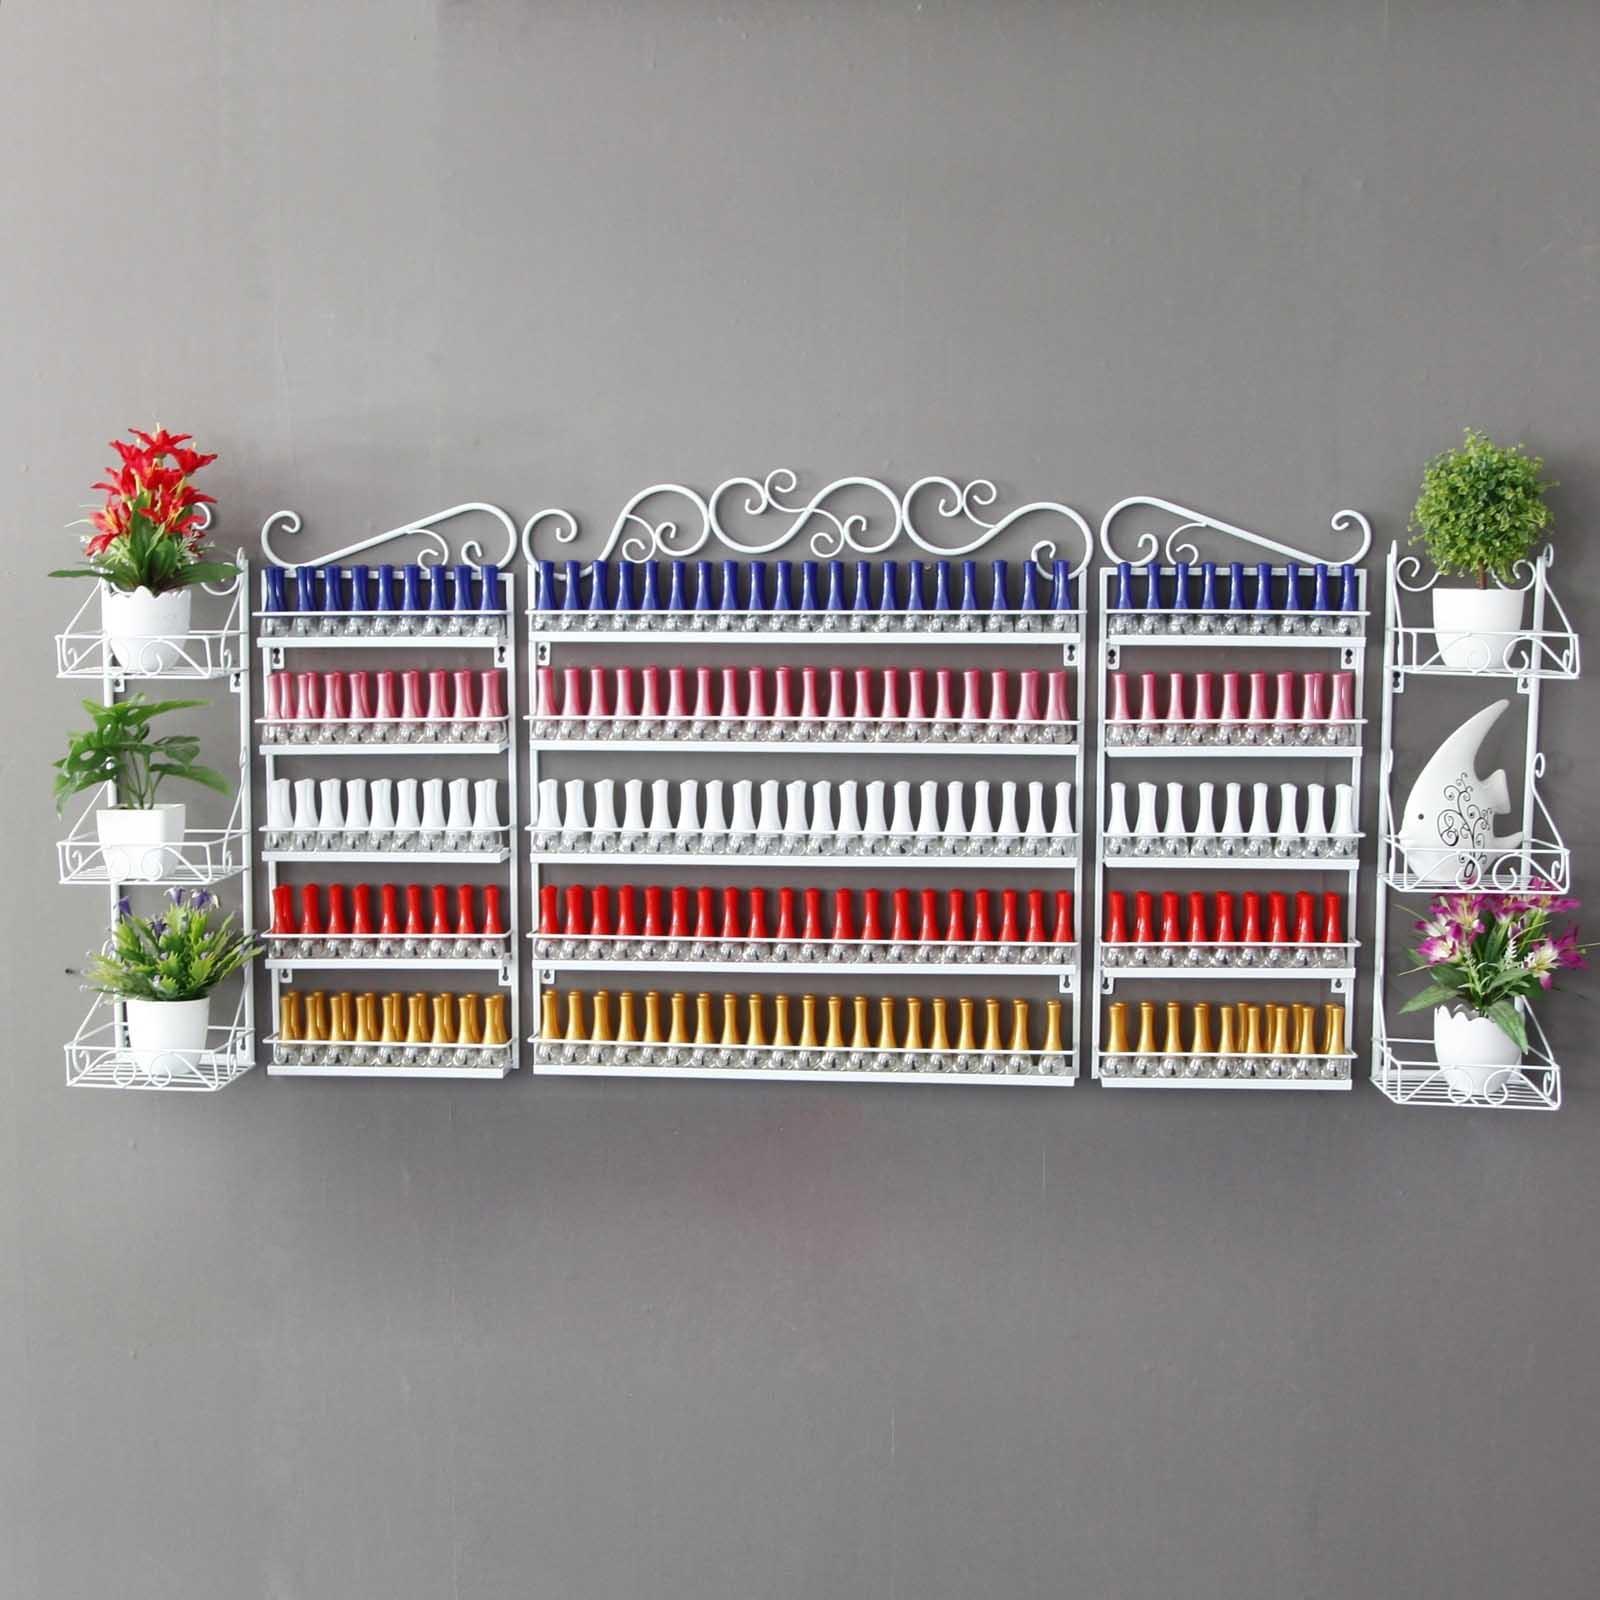 popular shop kitchen cabinets cheap shop kitchen cabinets lots